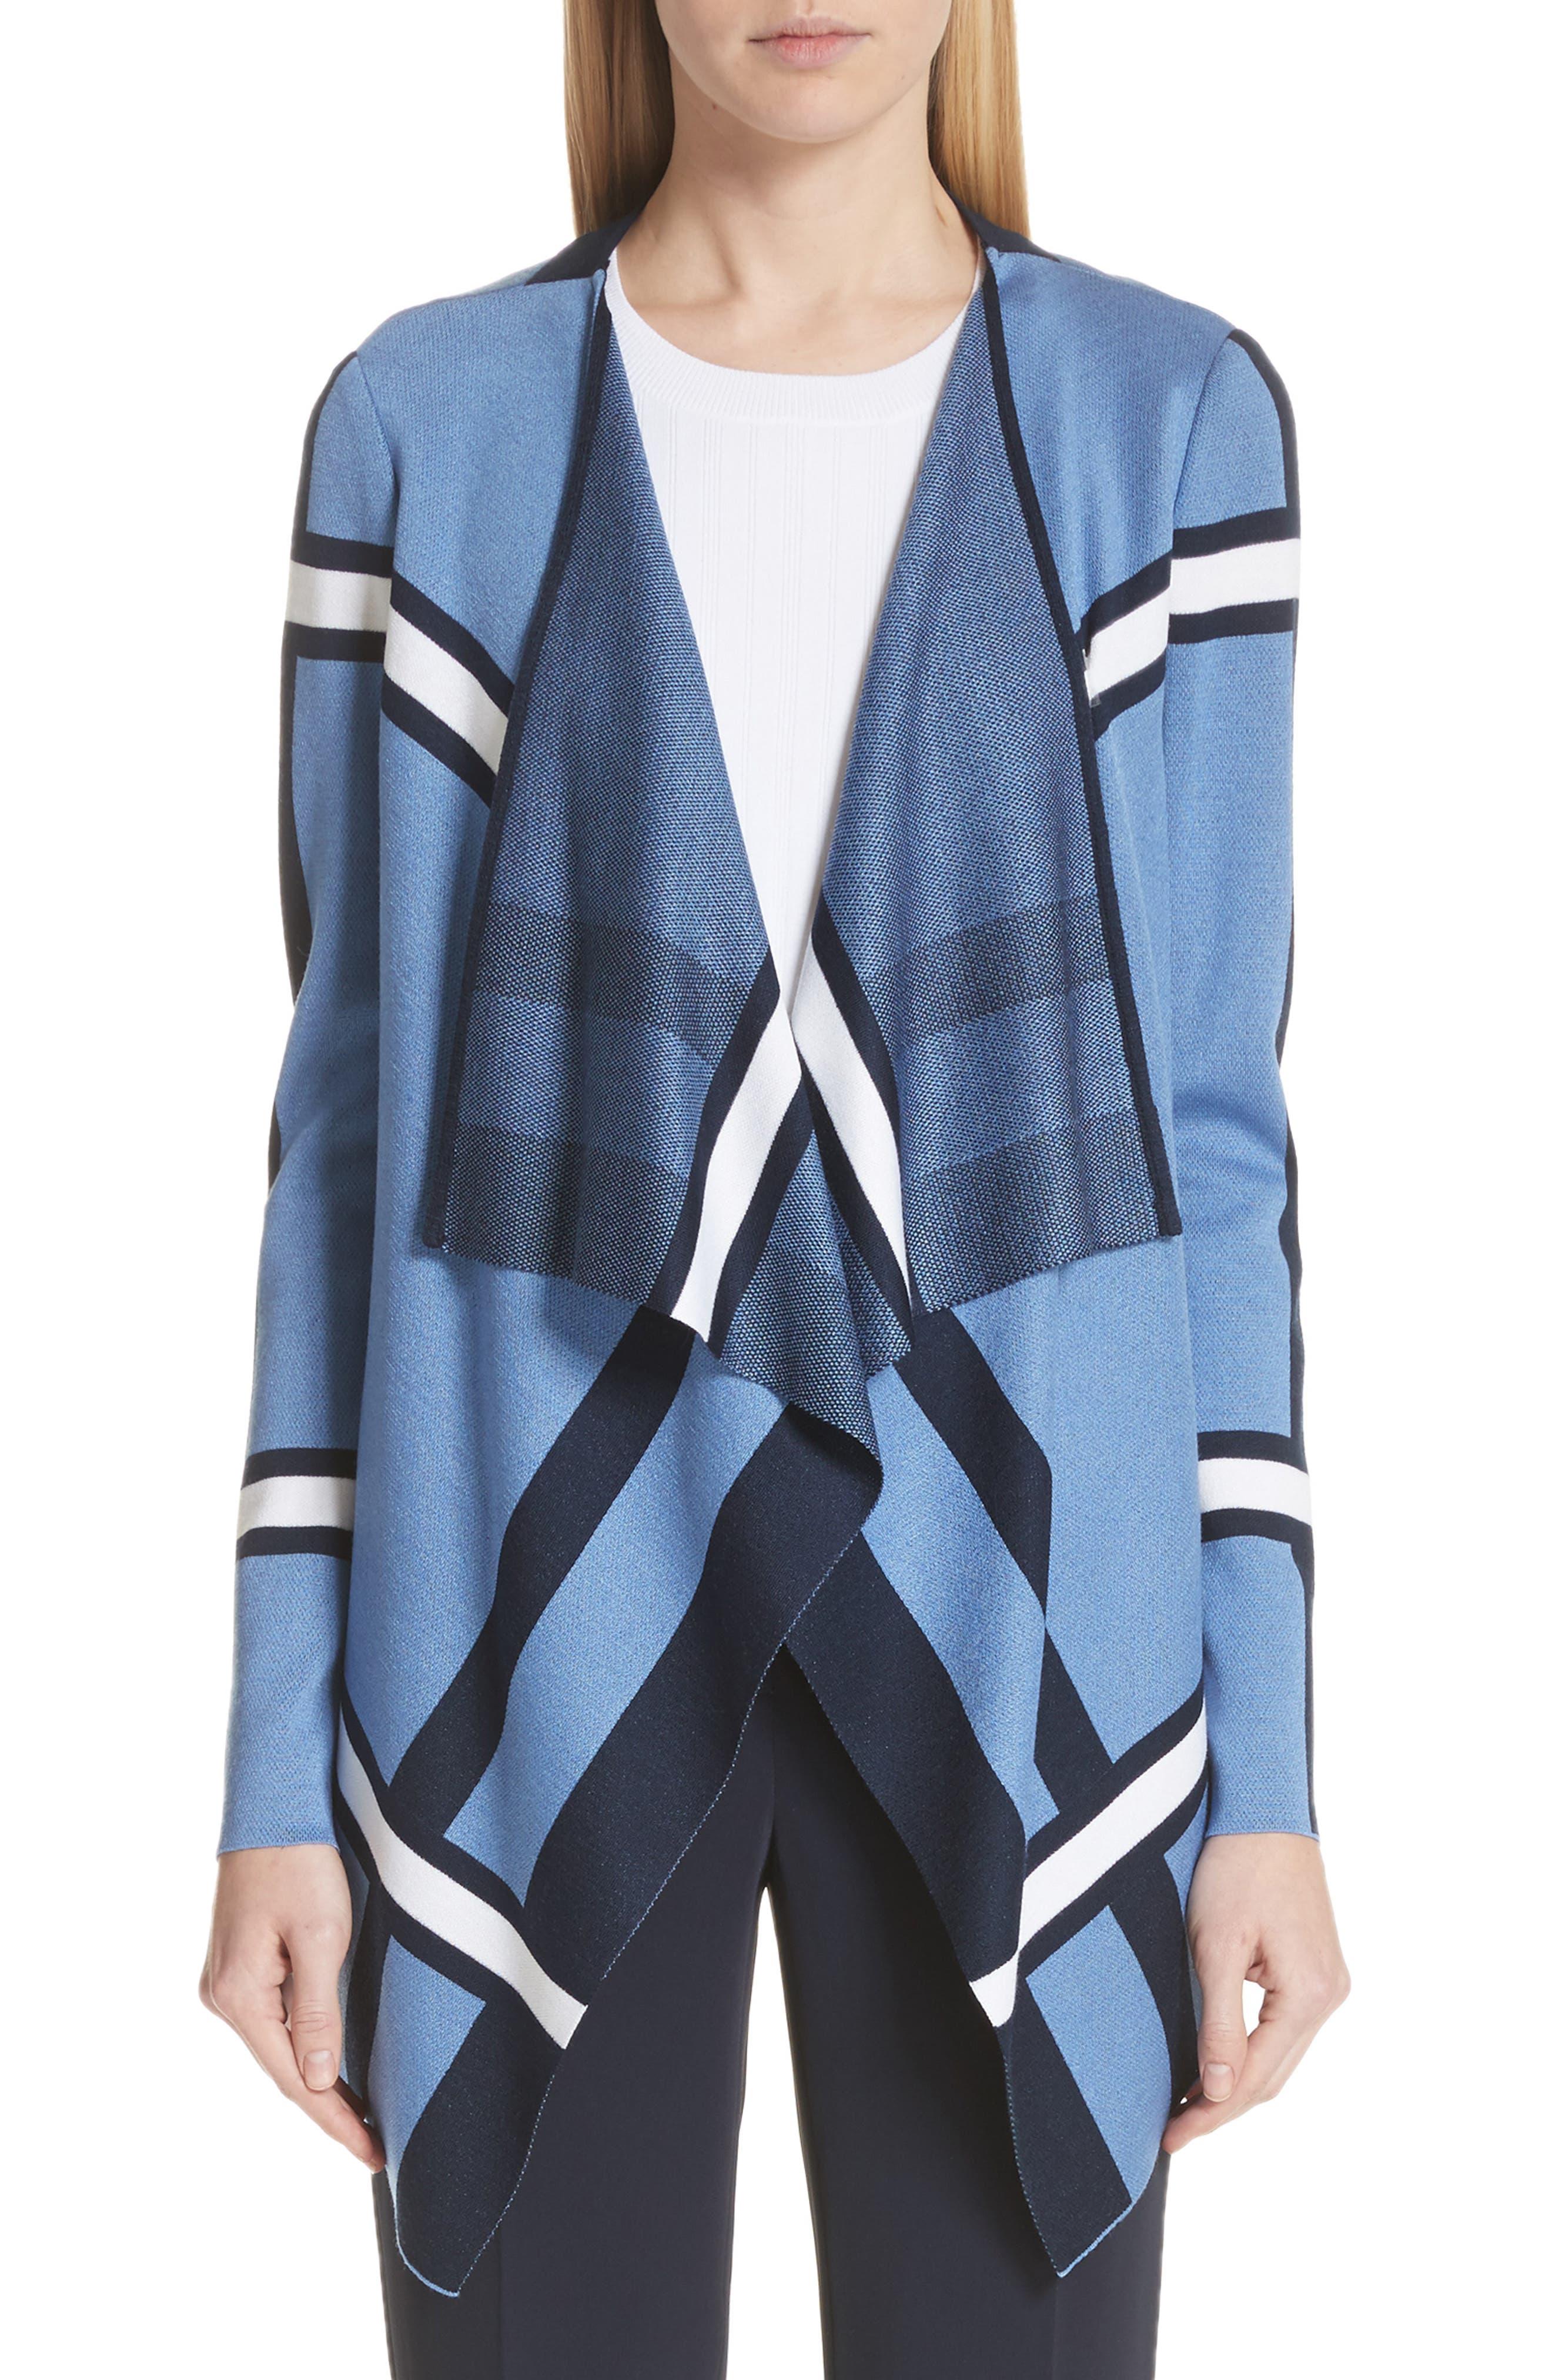 St. John Collection Variegated Stripe Cardigan, Size Petite - Blue